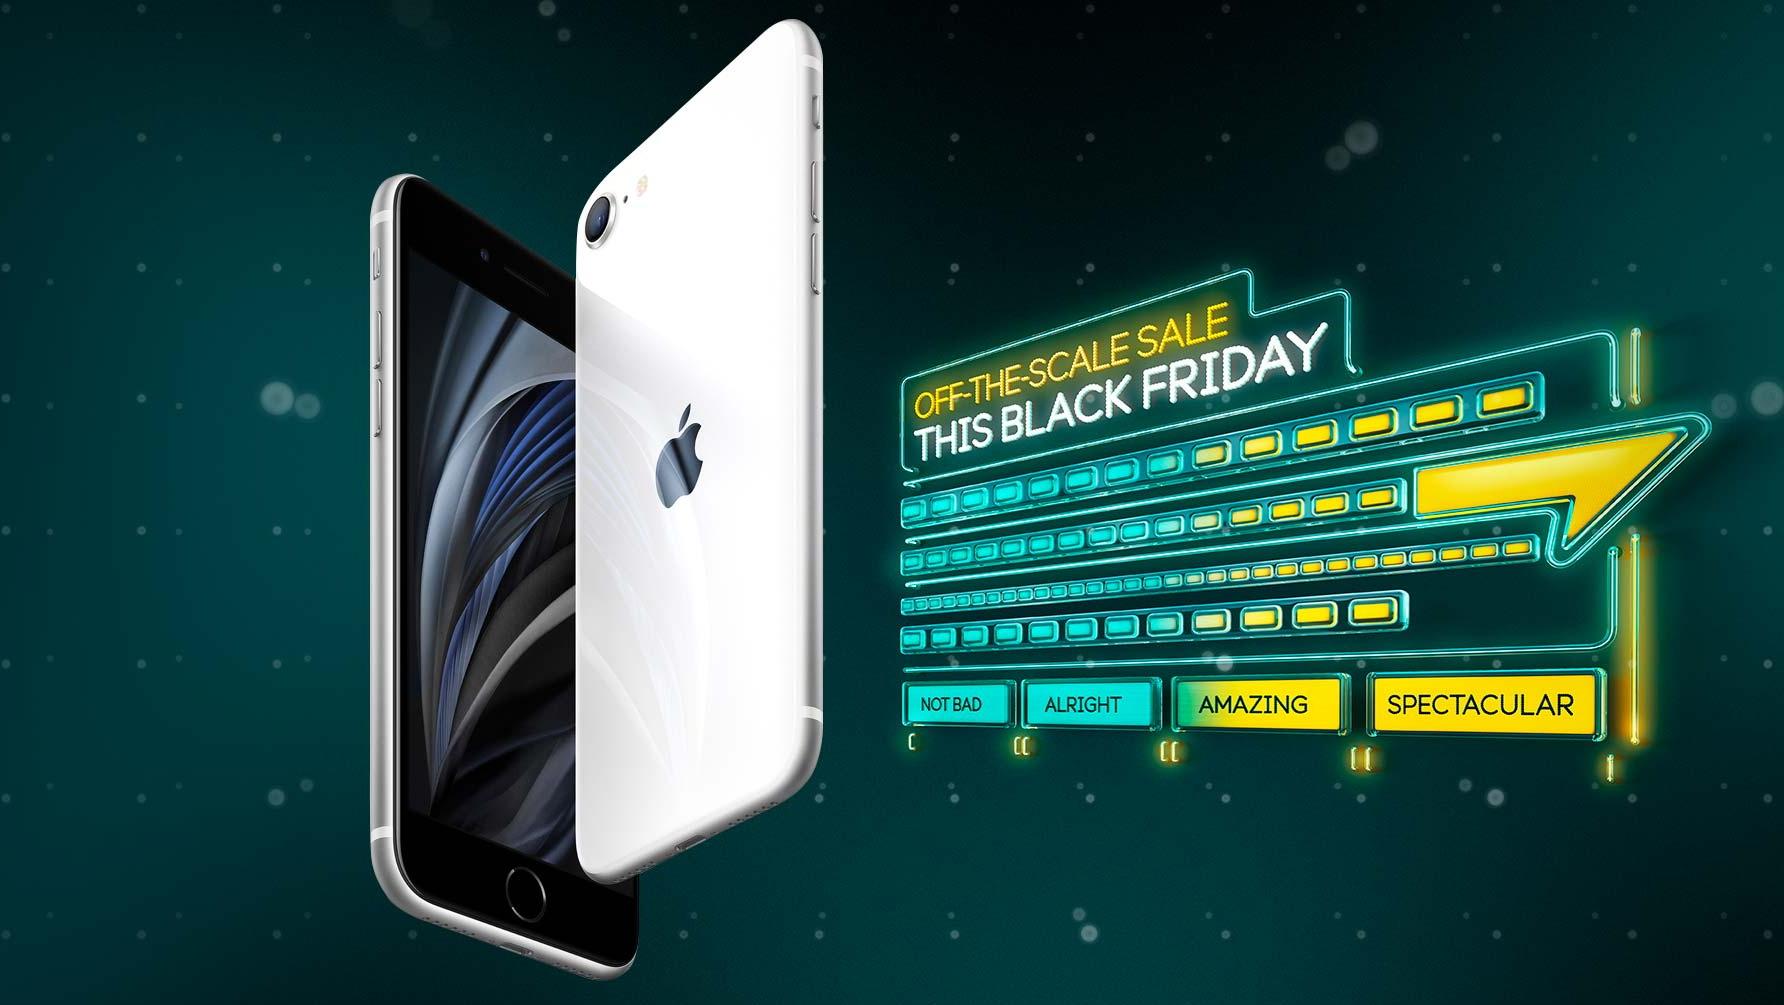 EE Black Friday iPhone SE deals